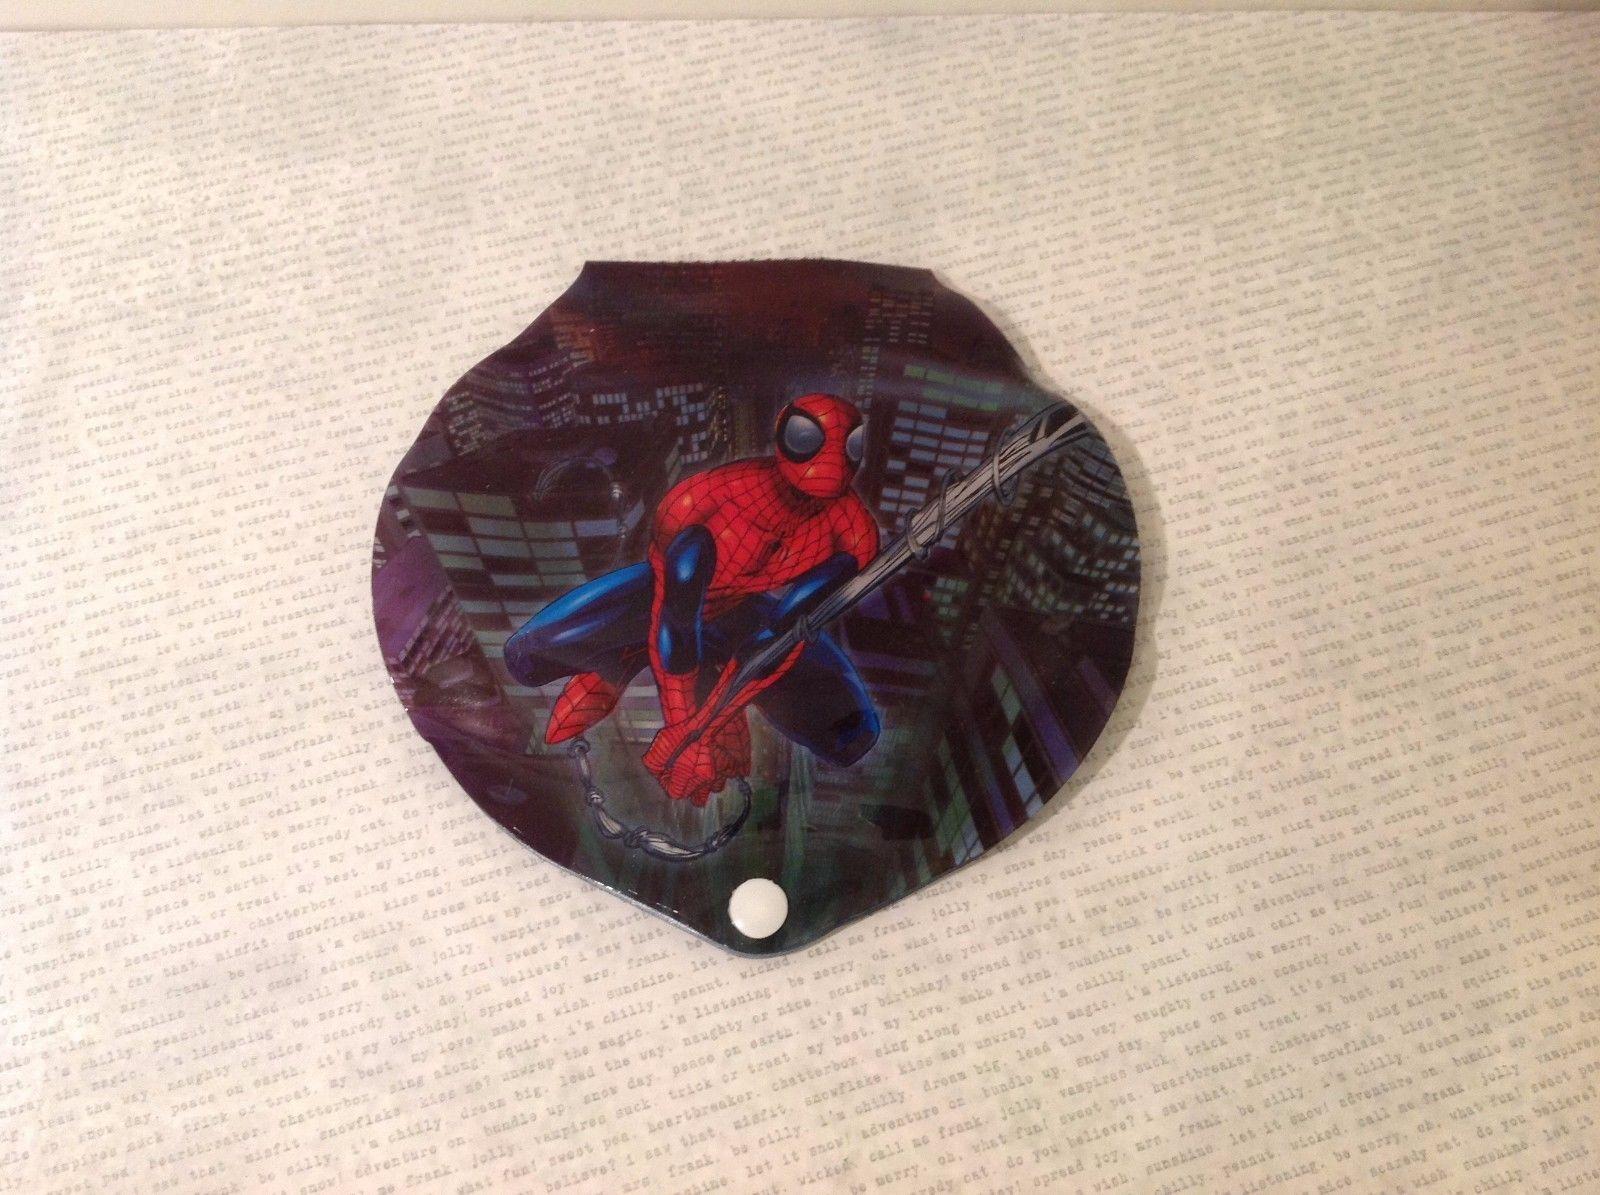 Spiderman 152 pc Fantastic Four 10 pc Plastic CD DVD Cases Fits 12 Discs Soft